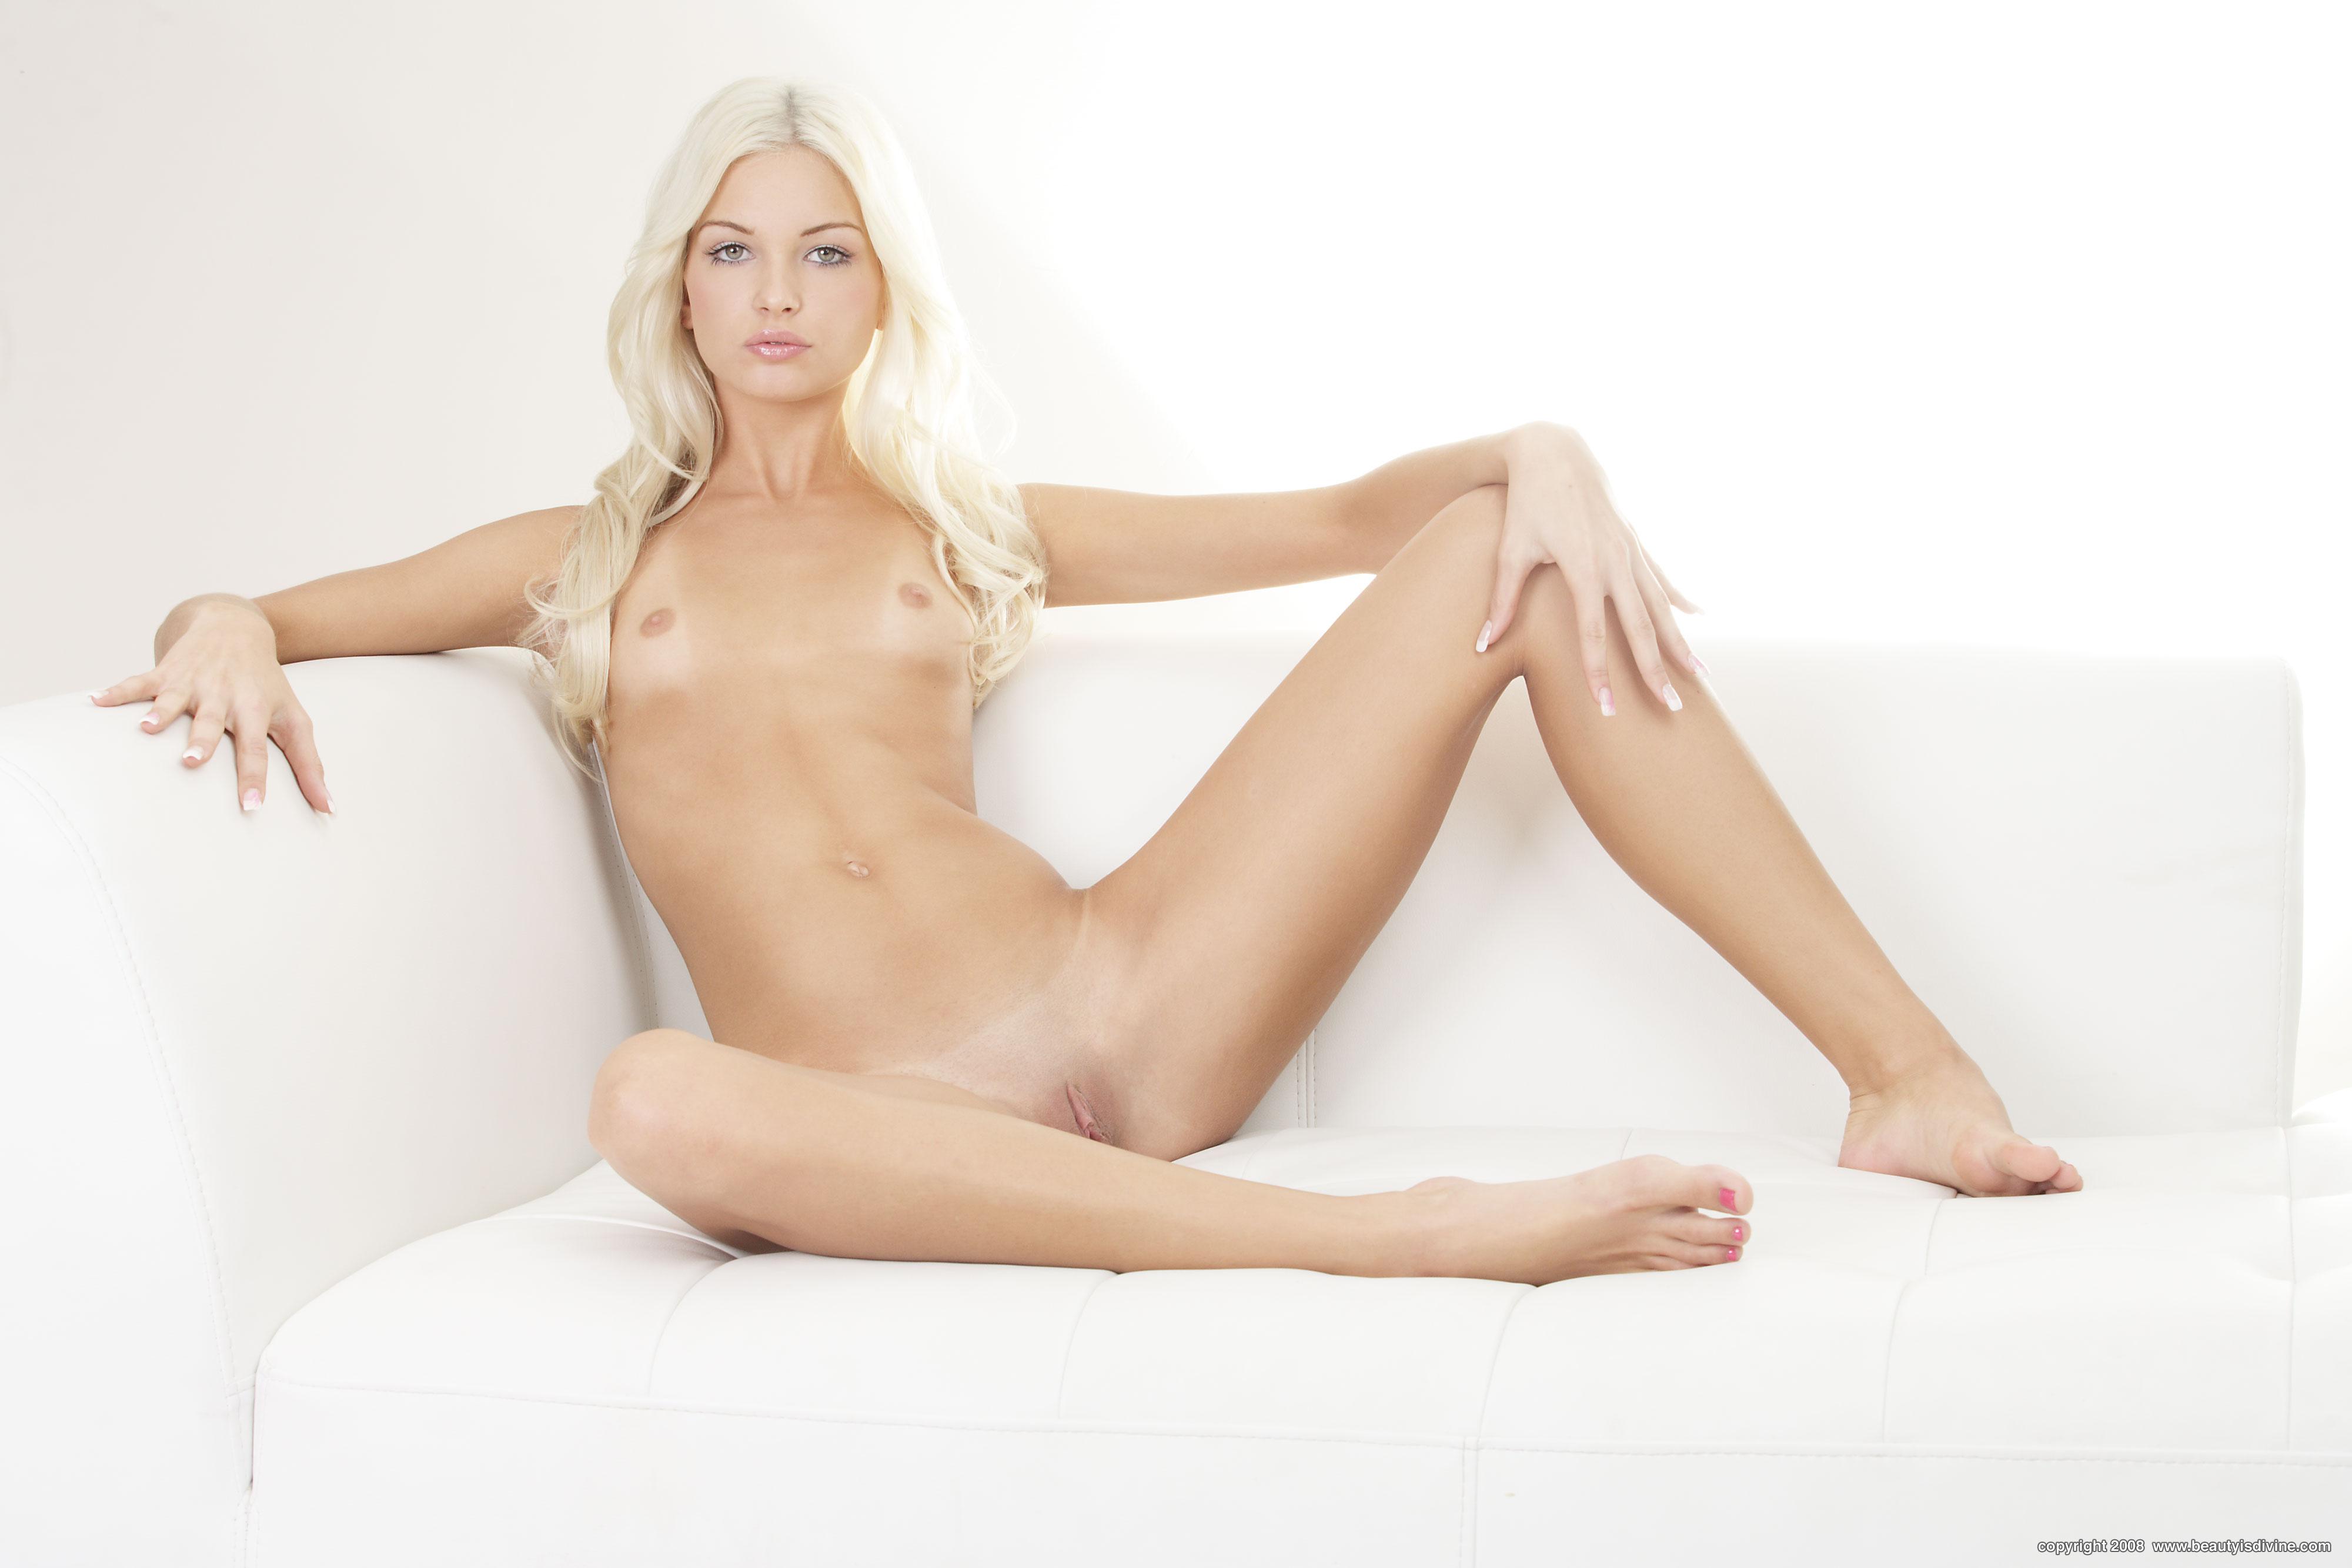 Шведские модели эротика 1 фотография